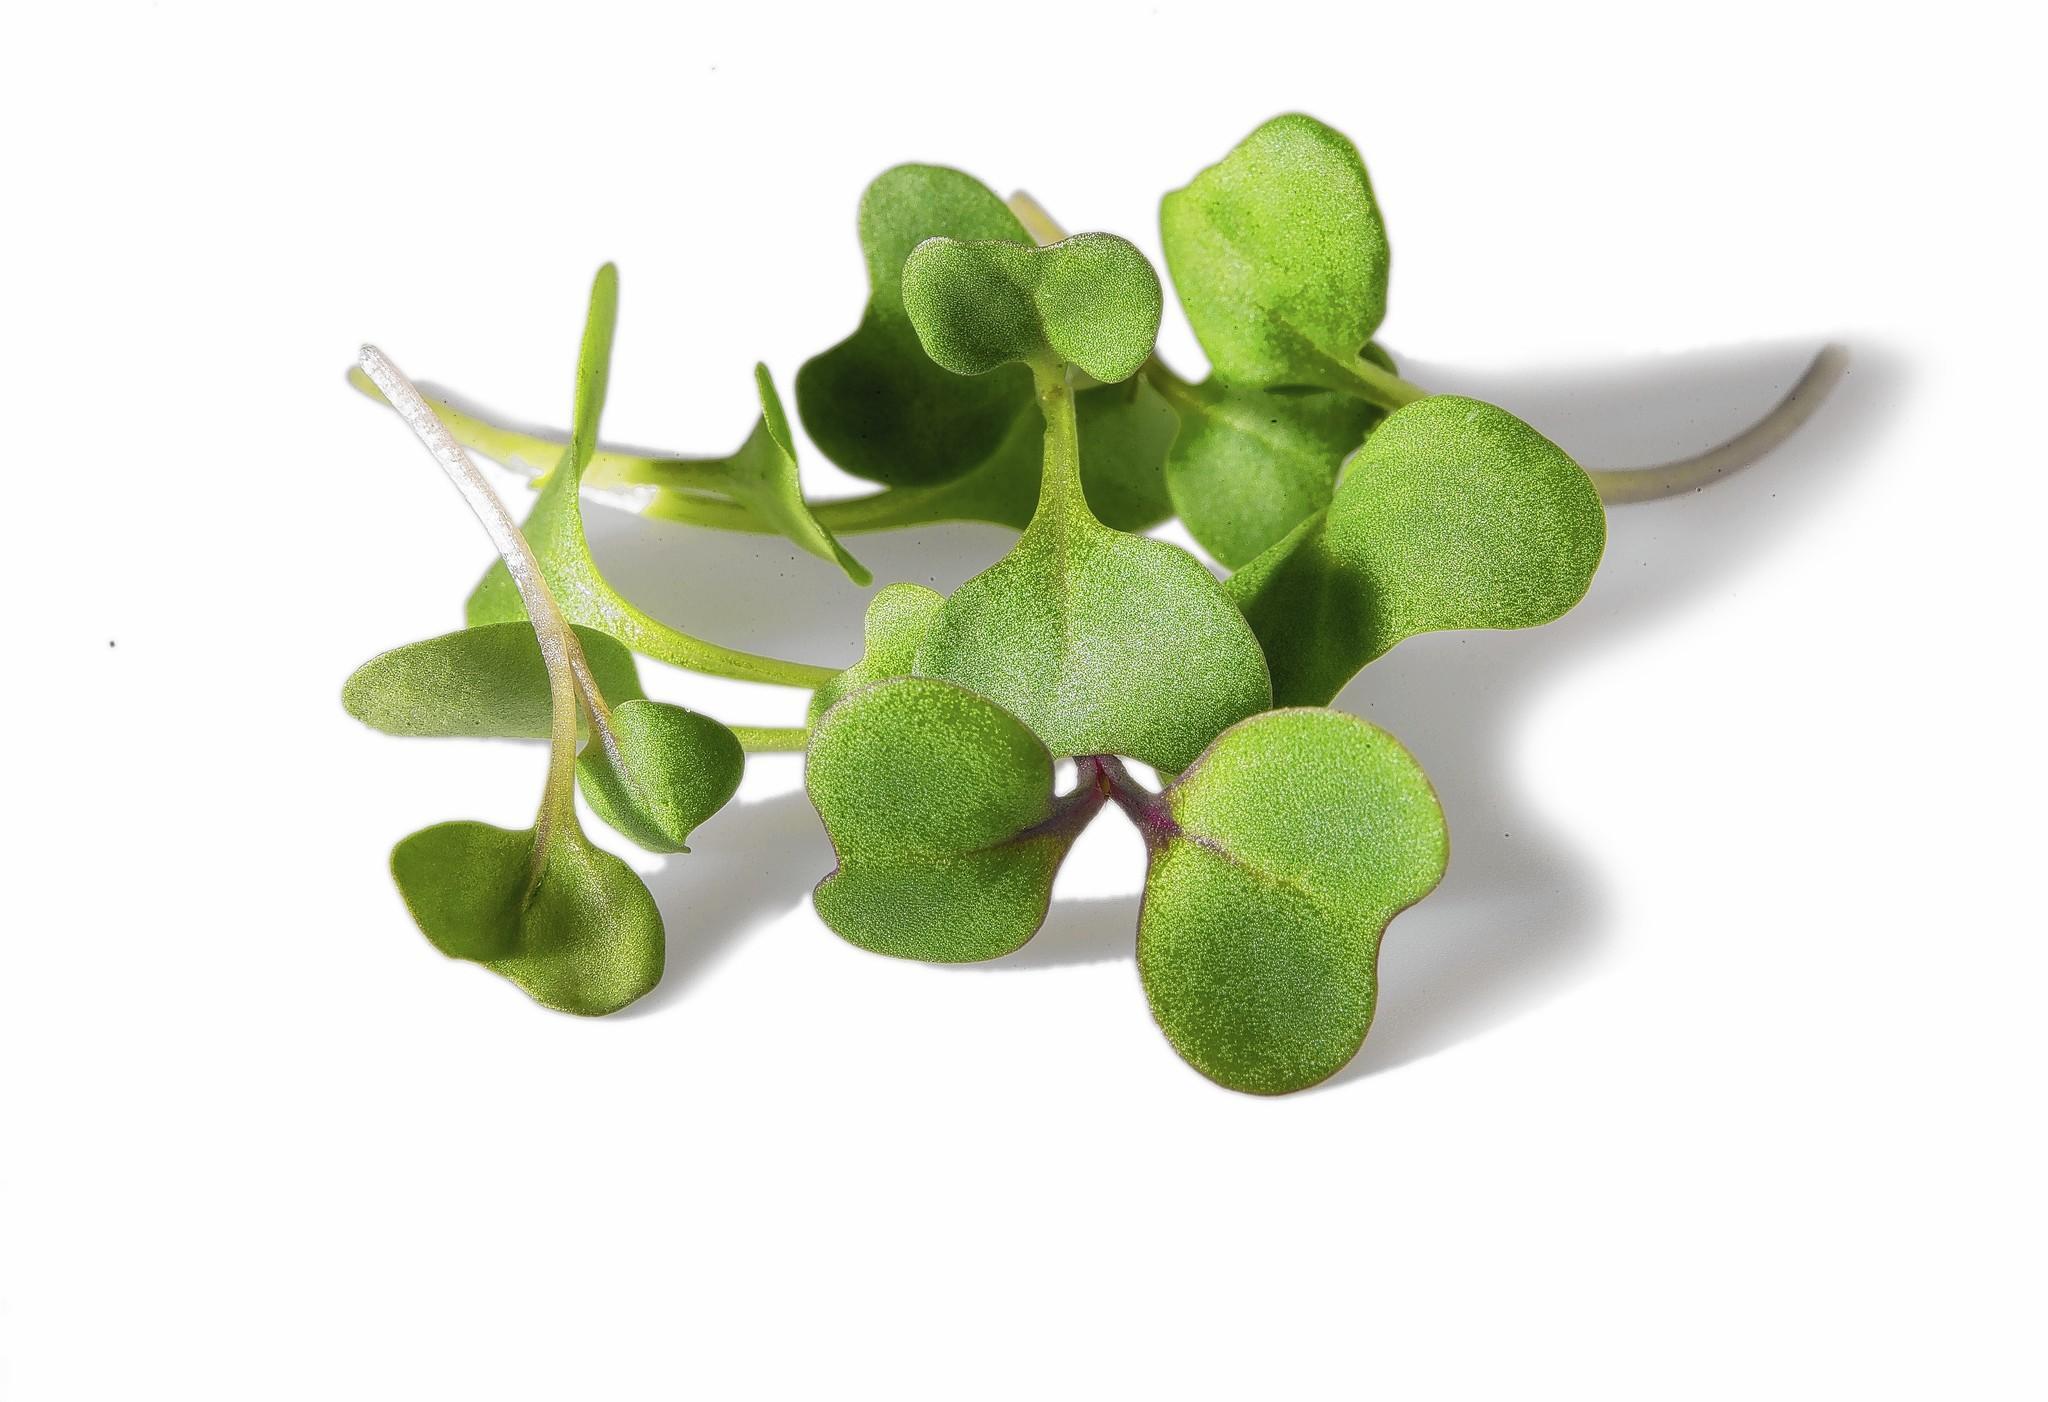 A photograph of broccoli microgreens.